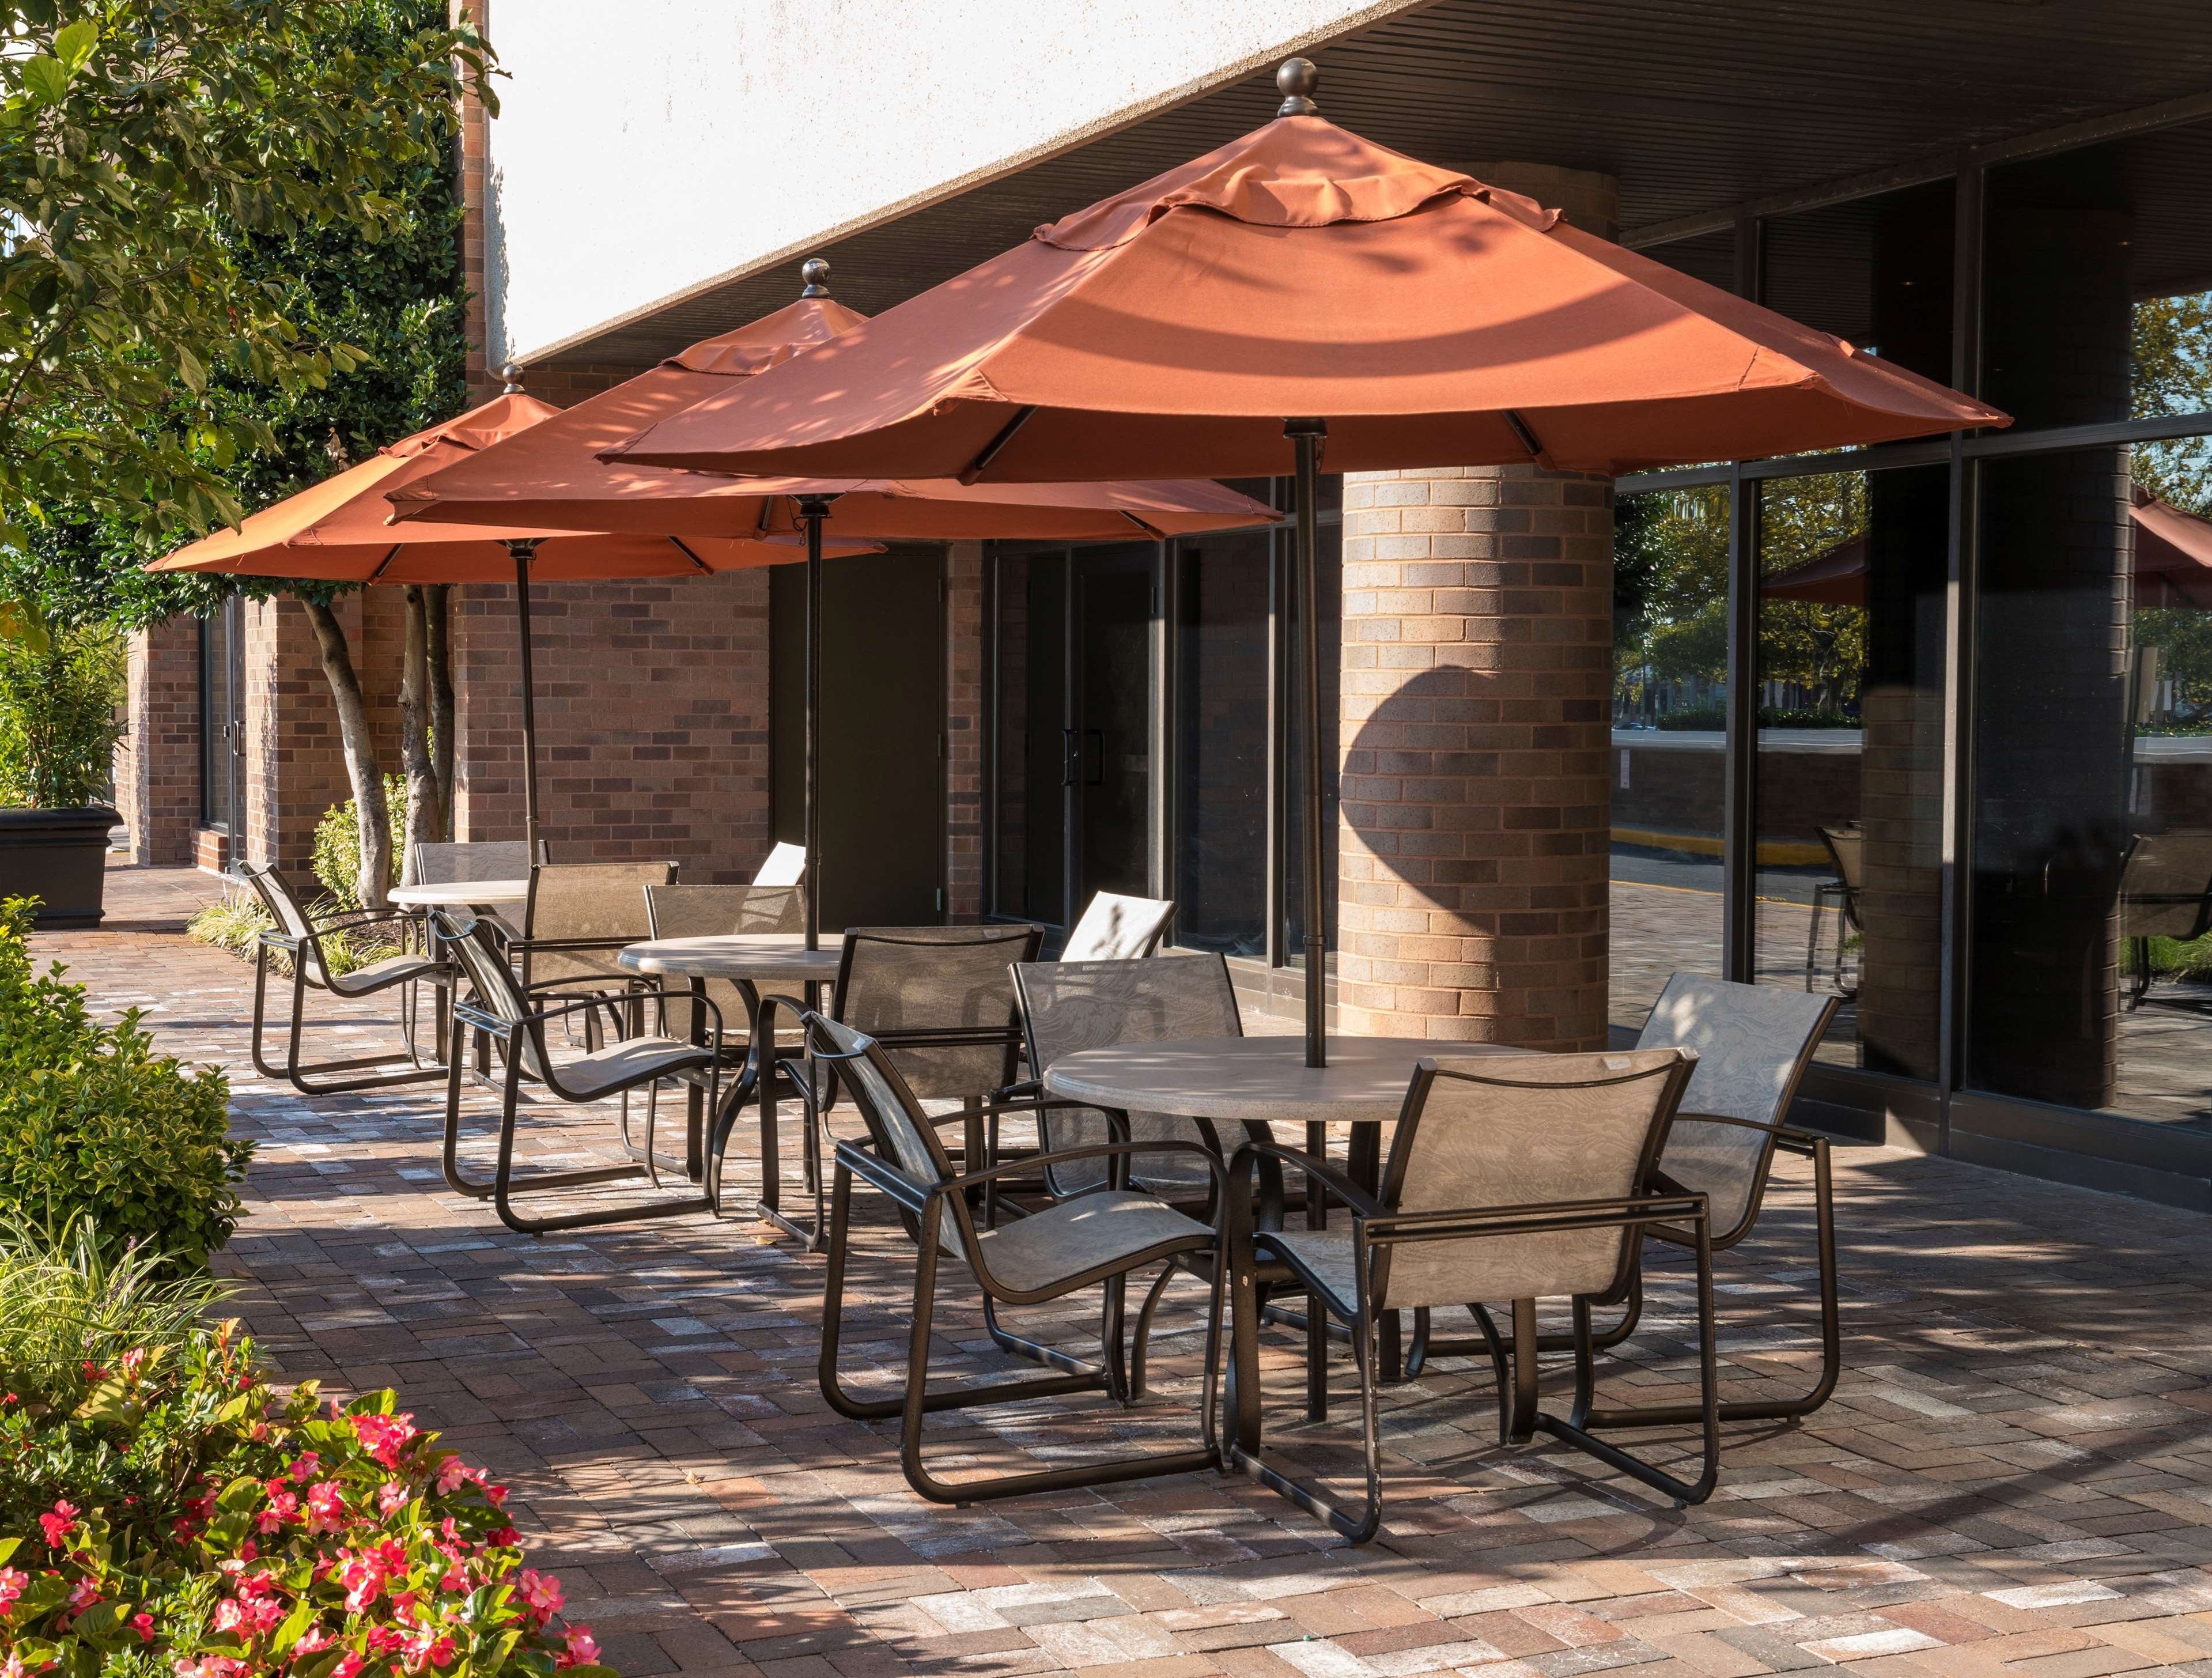 Hilton Washington DC/Rockville Hotel & Executive Meeting Ctr image 21